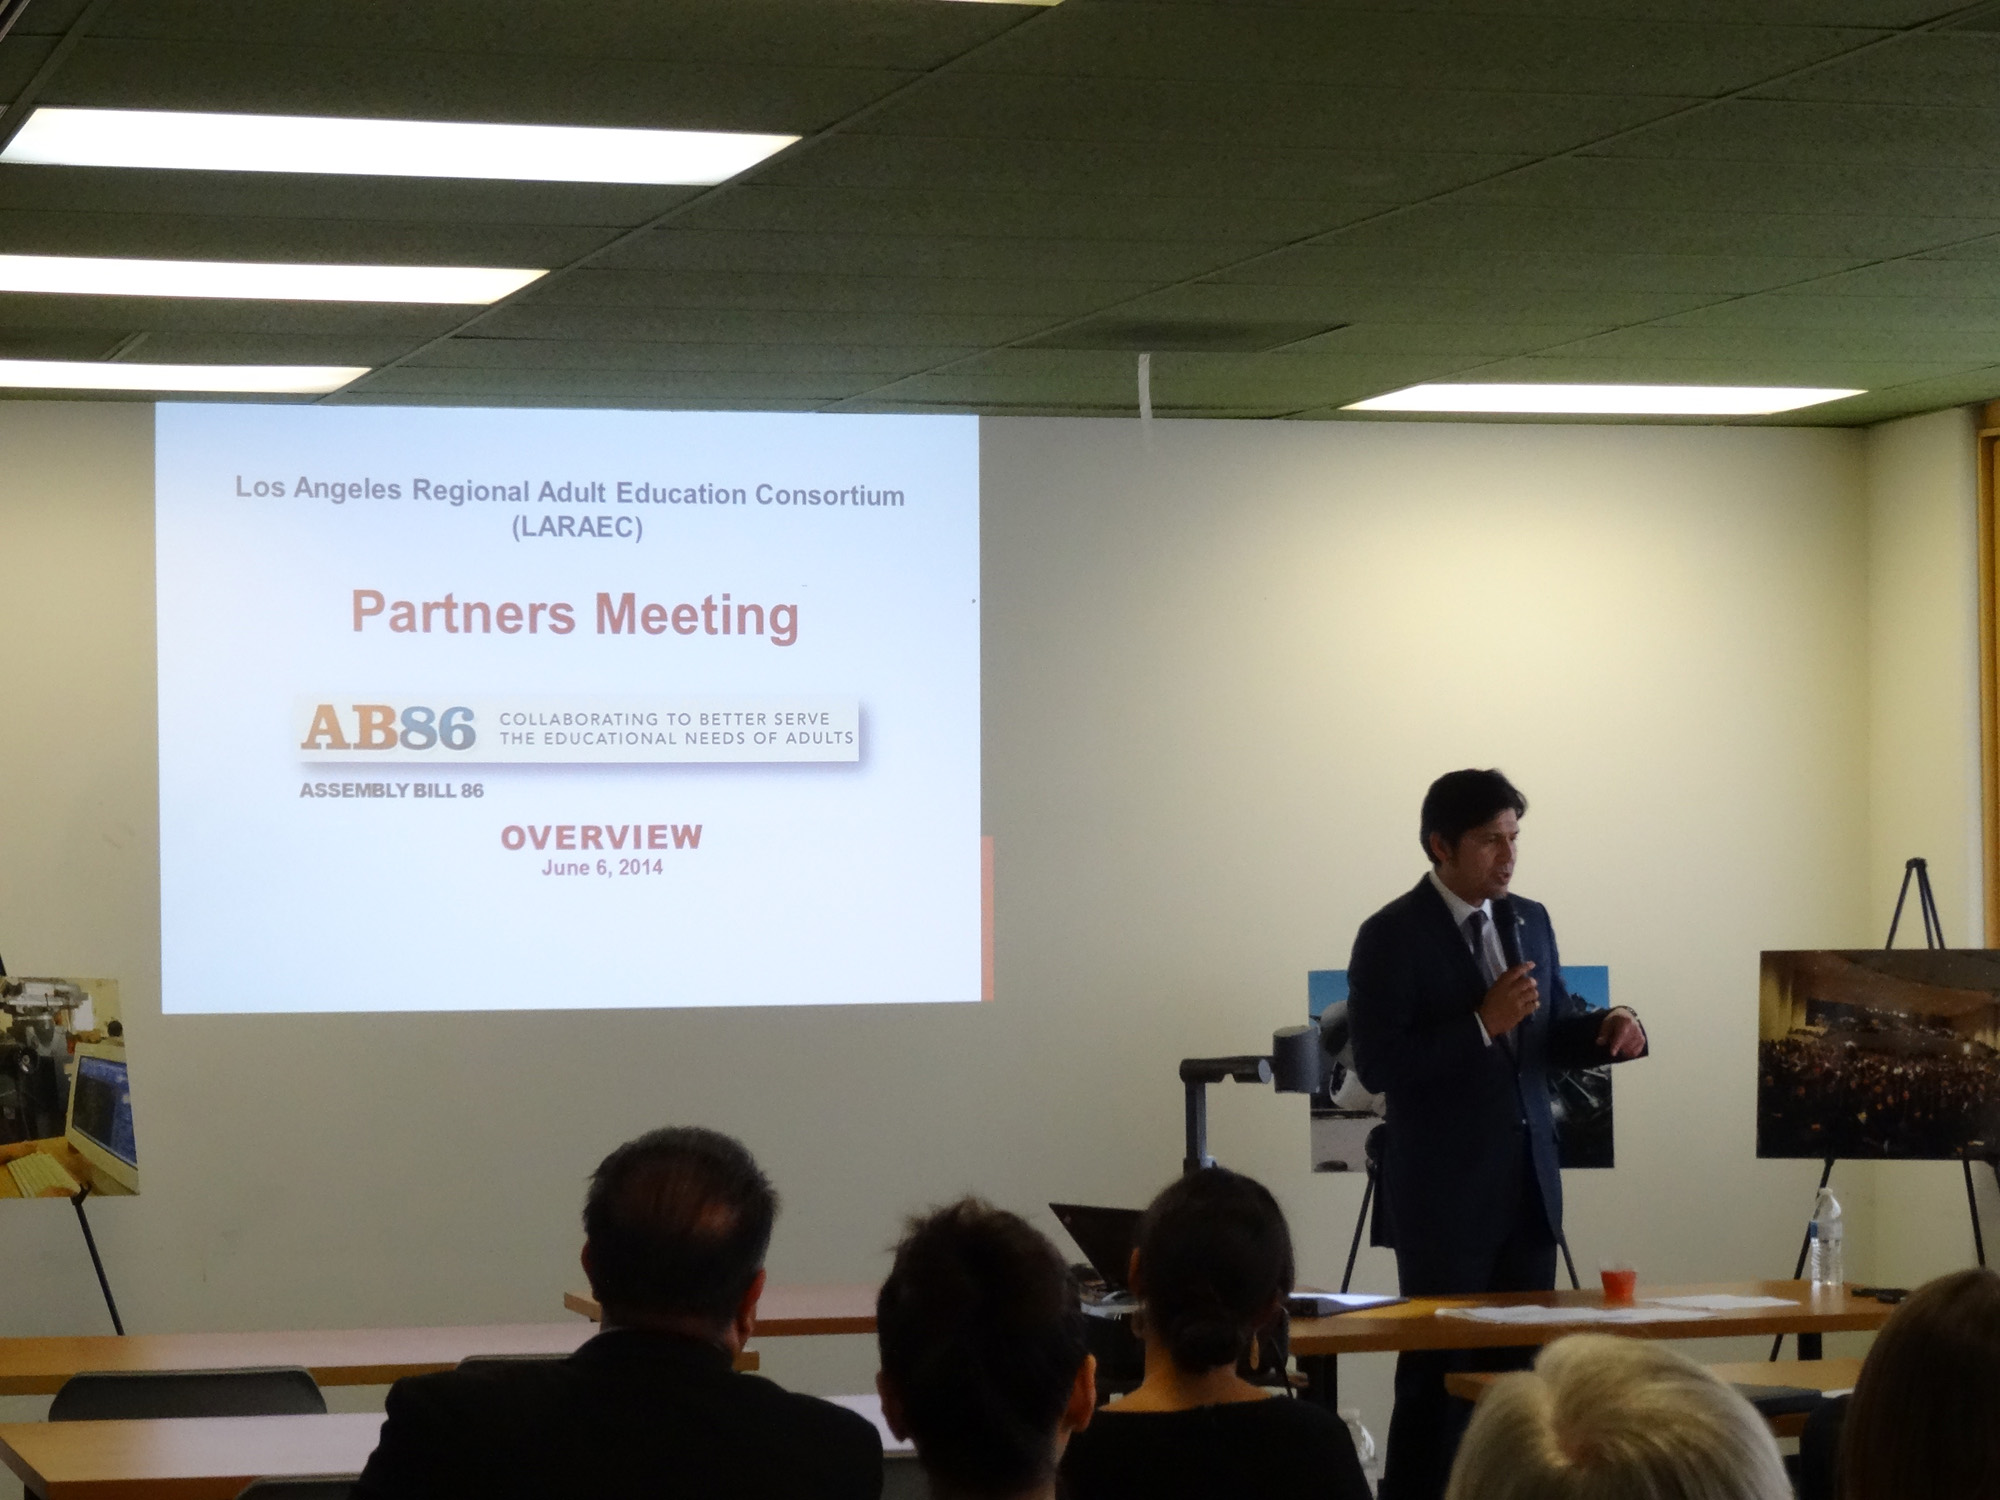 LARAEC-Partners-Meeting-06-06-14-11